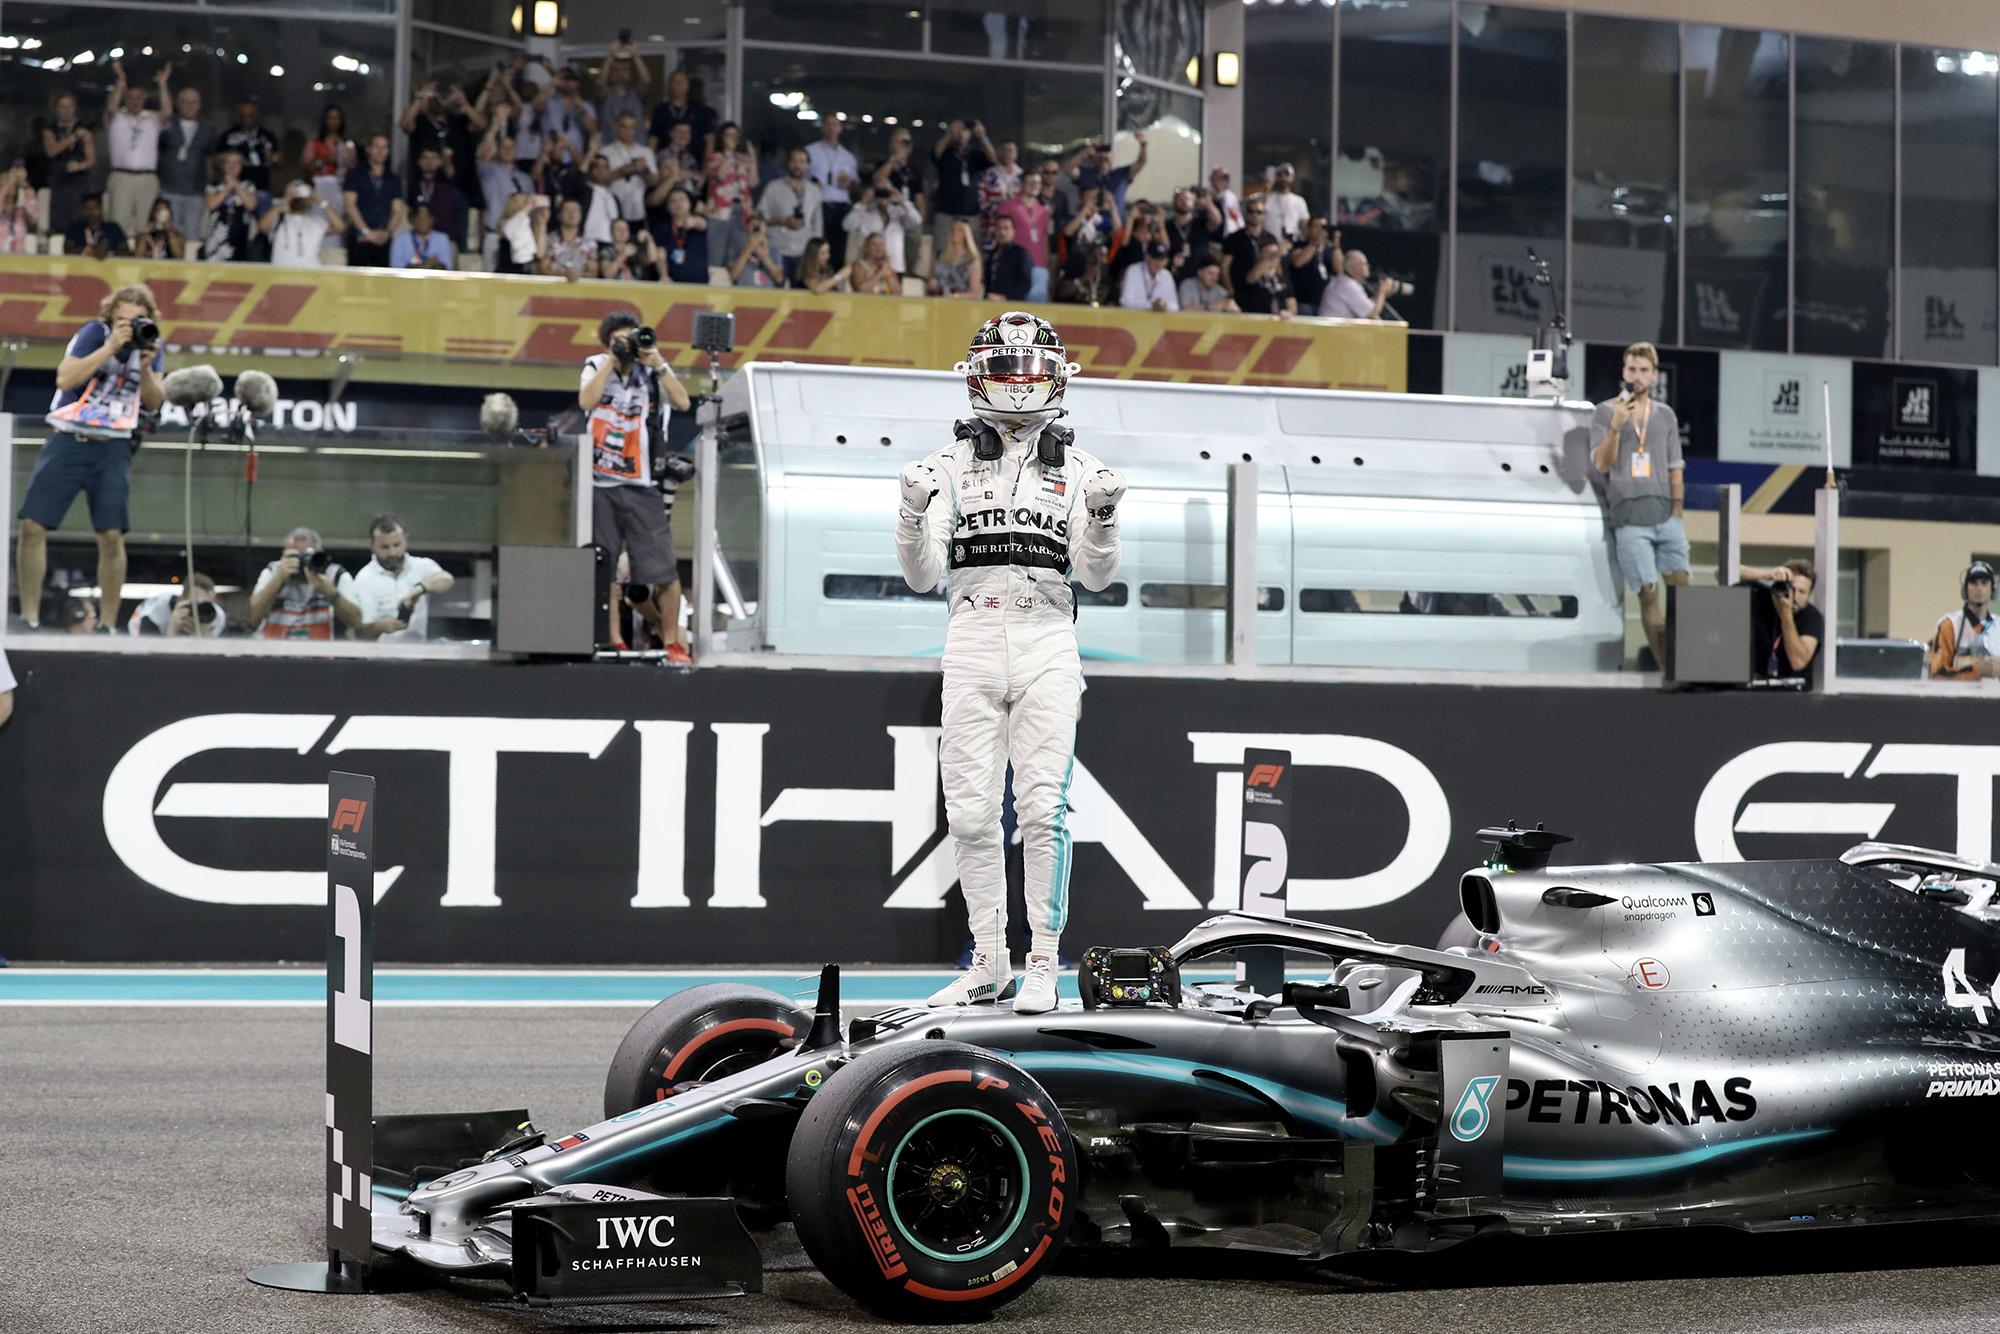 Lewis Hamilton celebrates securing pole position at the 2019 Abu Dhabi Grand Prix